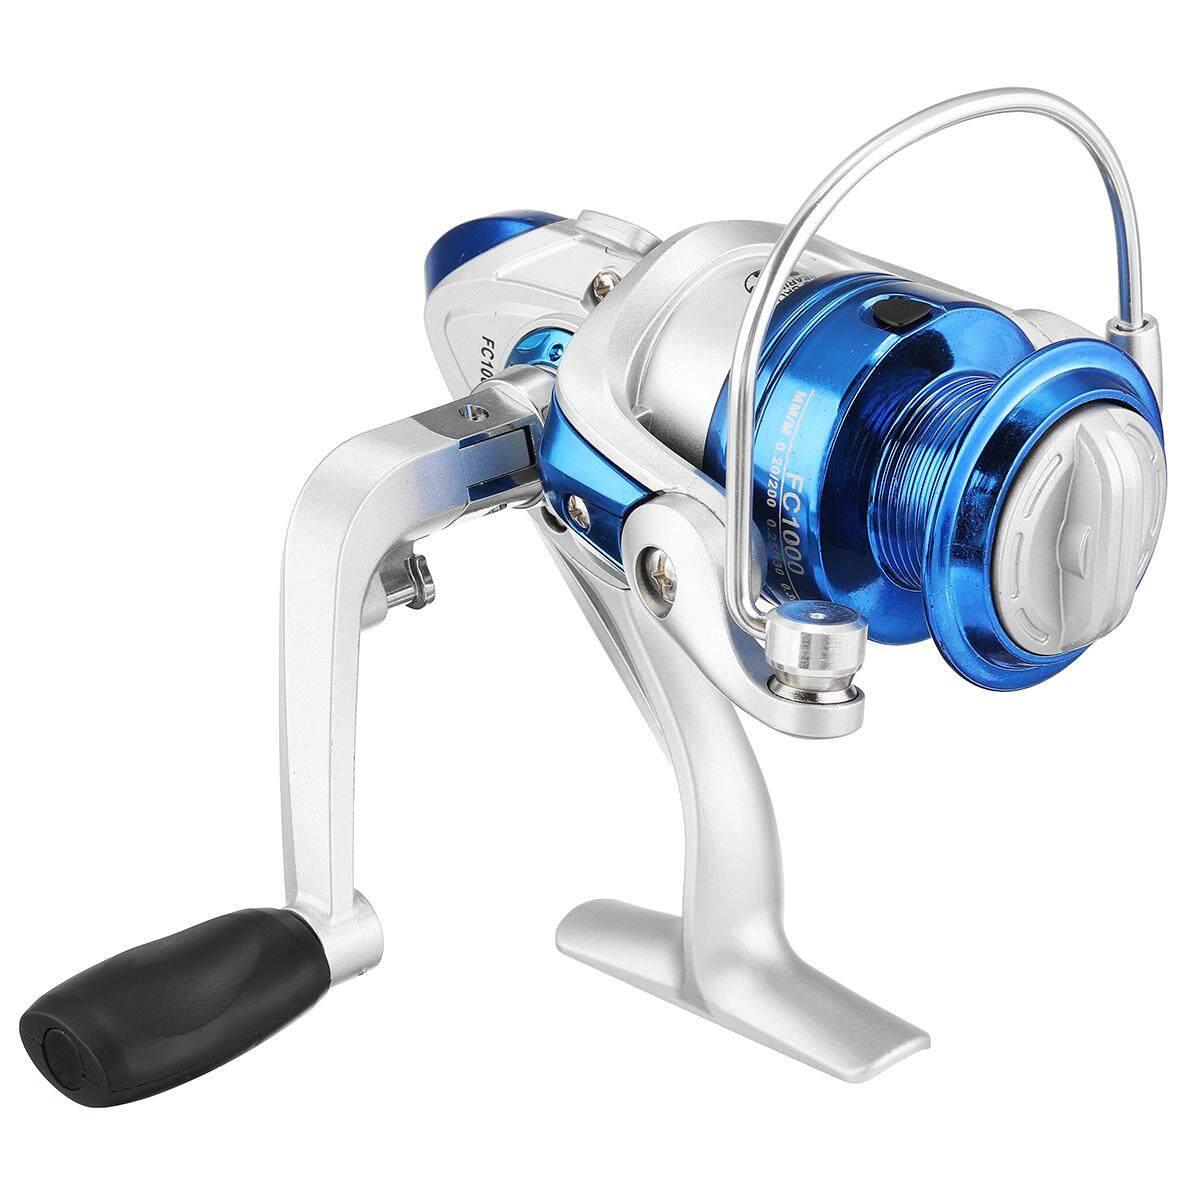 8 Bearings Spinning Reel 5.2:1 Fixed Pool Sea Fishing Tackle FC6000